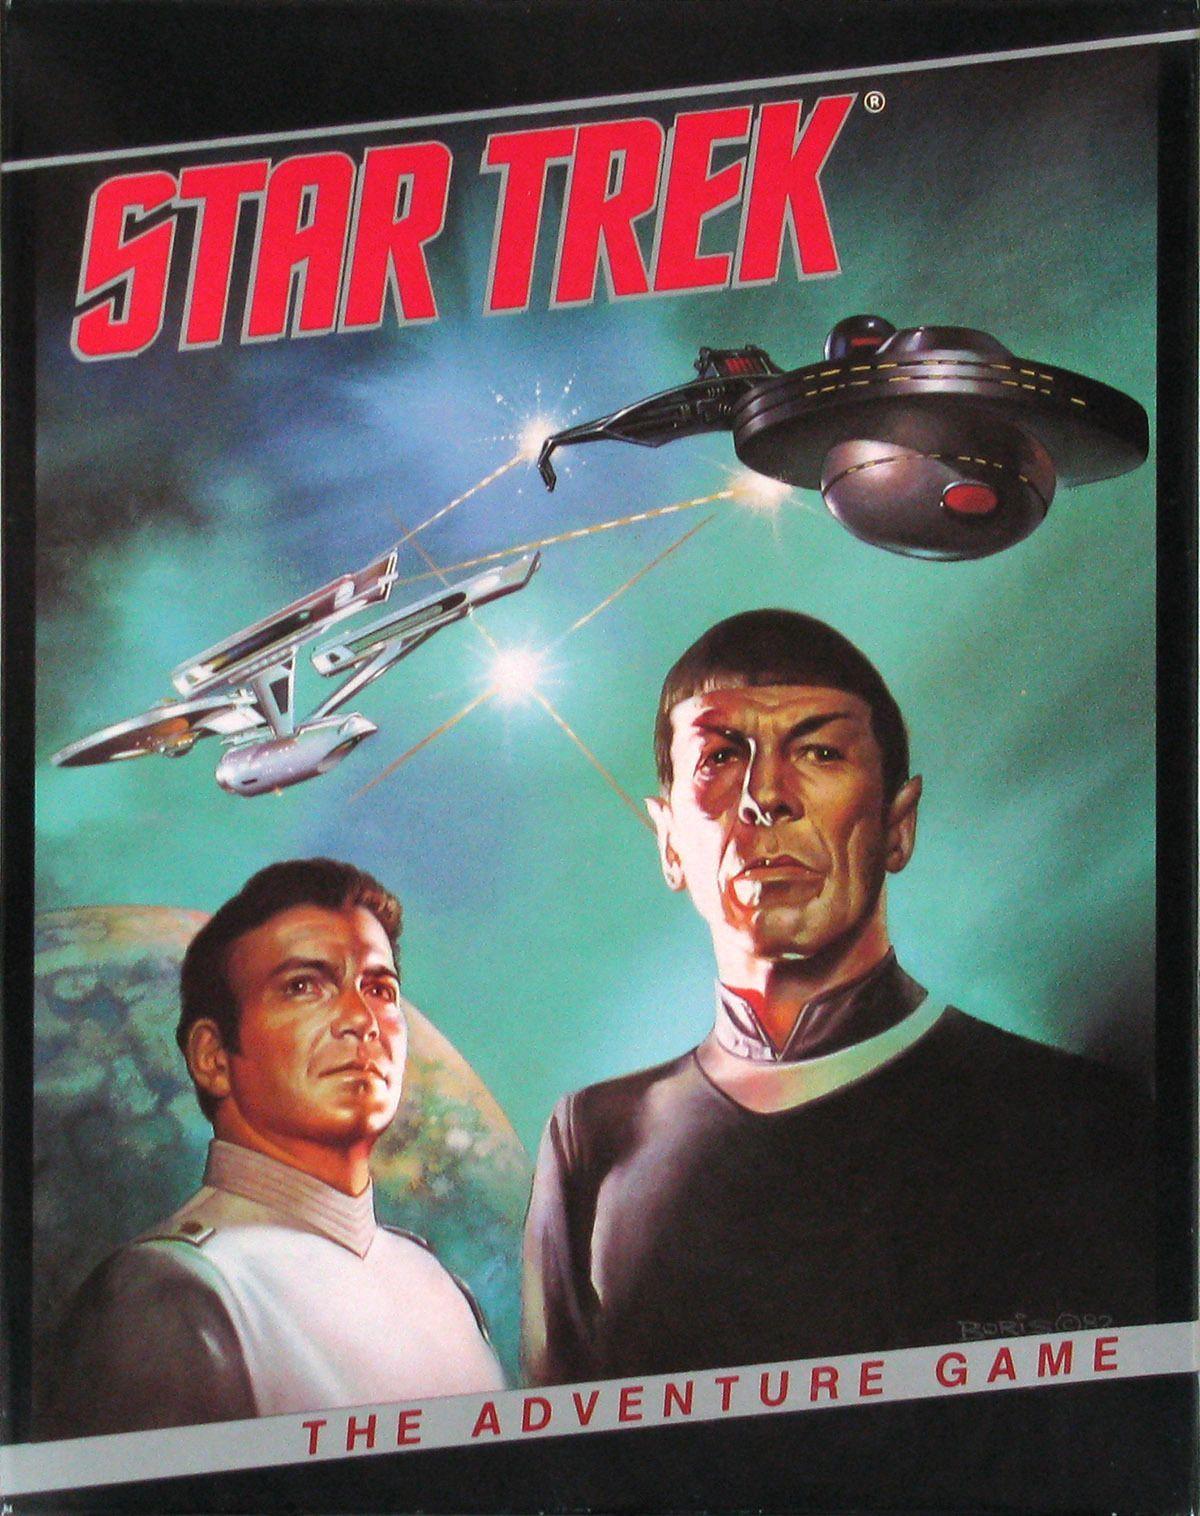 Star Trek: The Adventure Game